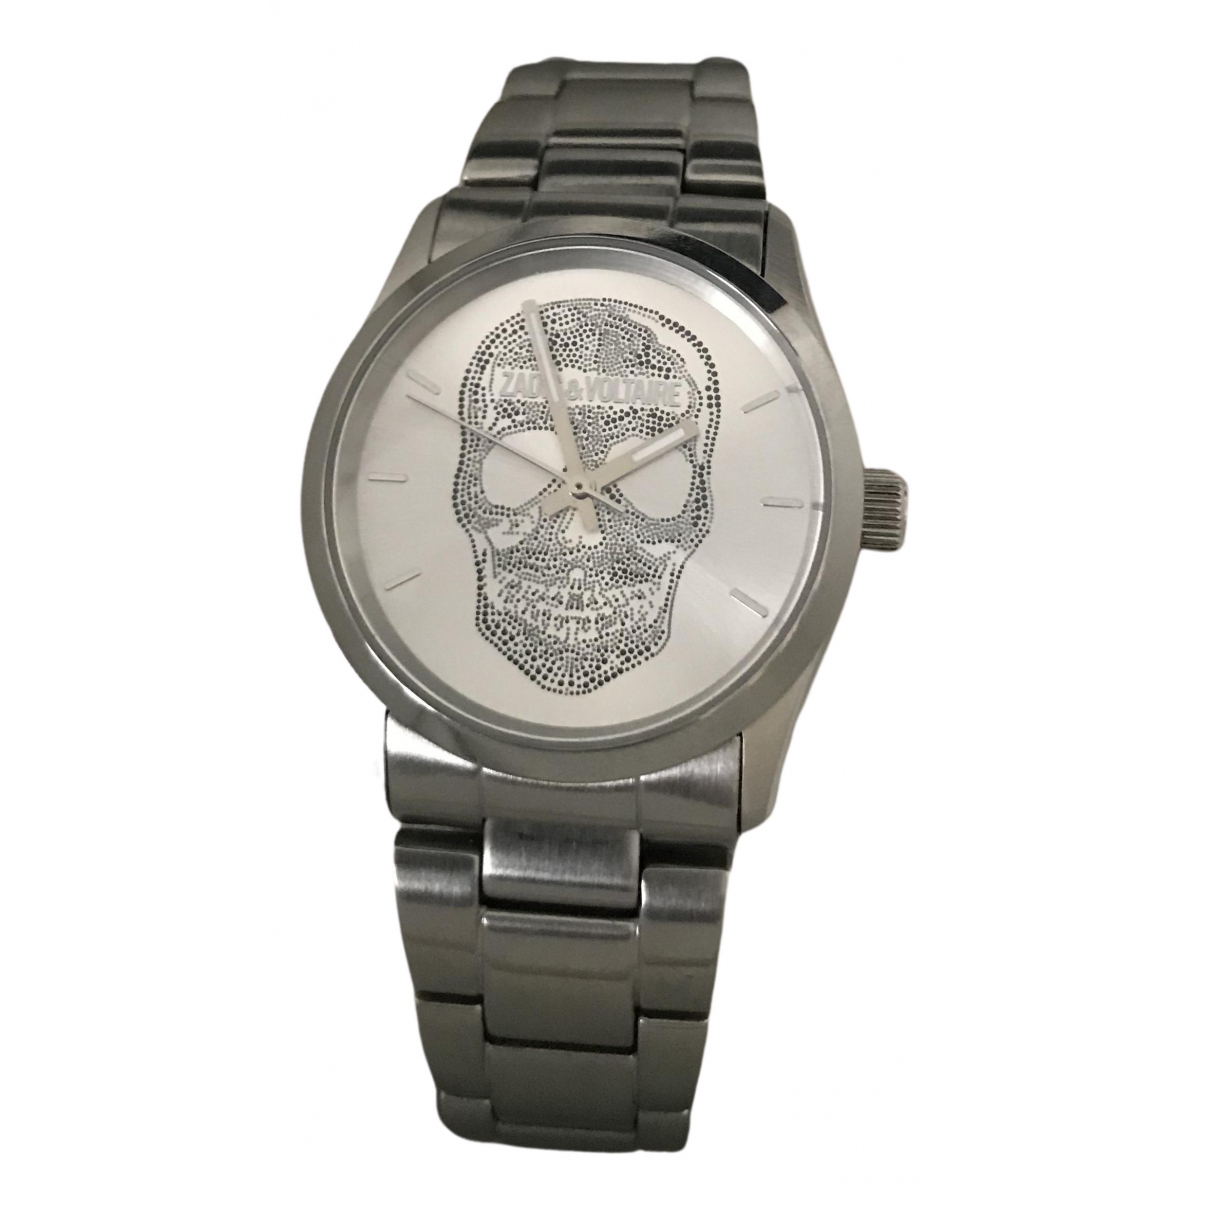 Reloj Tete de mort Zadig & Voltaire